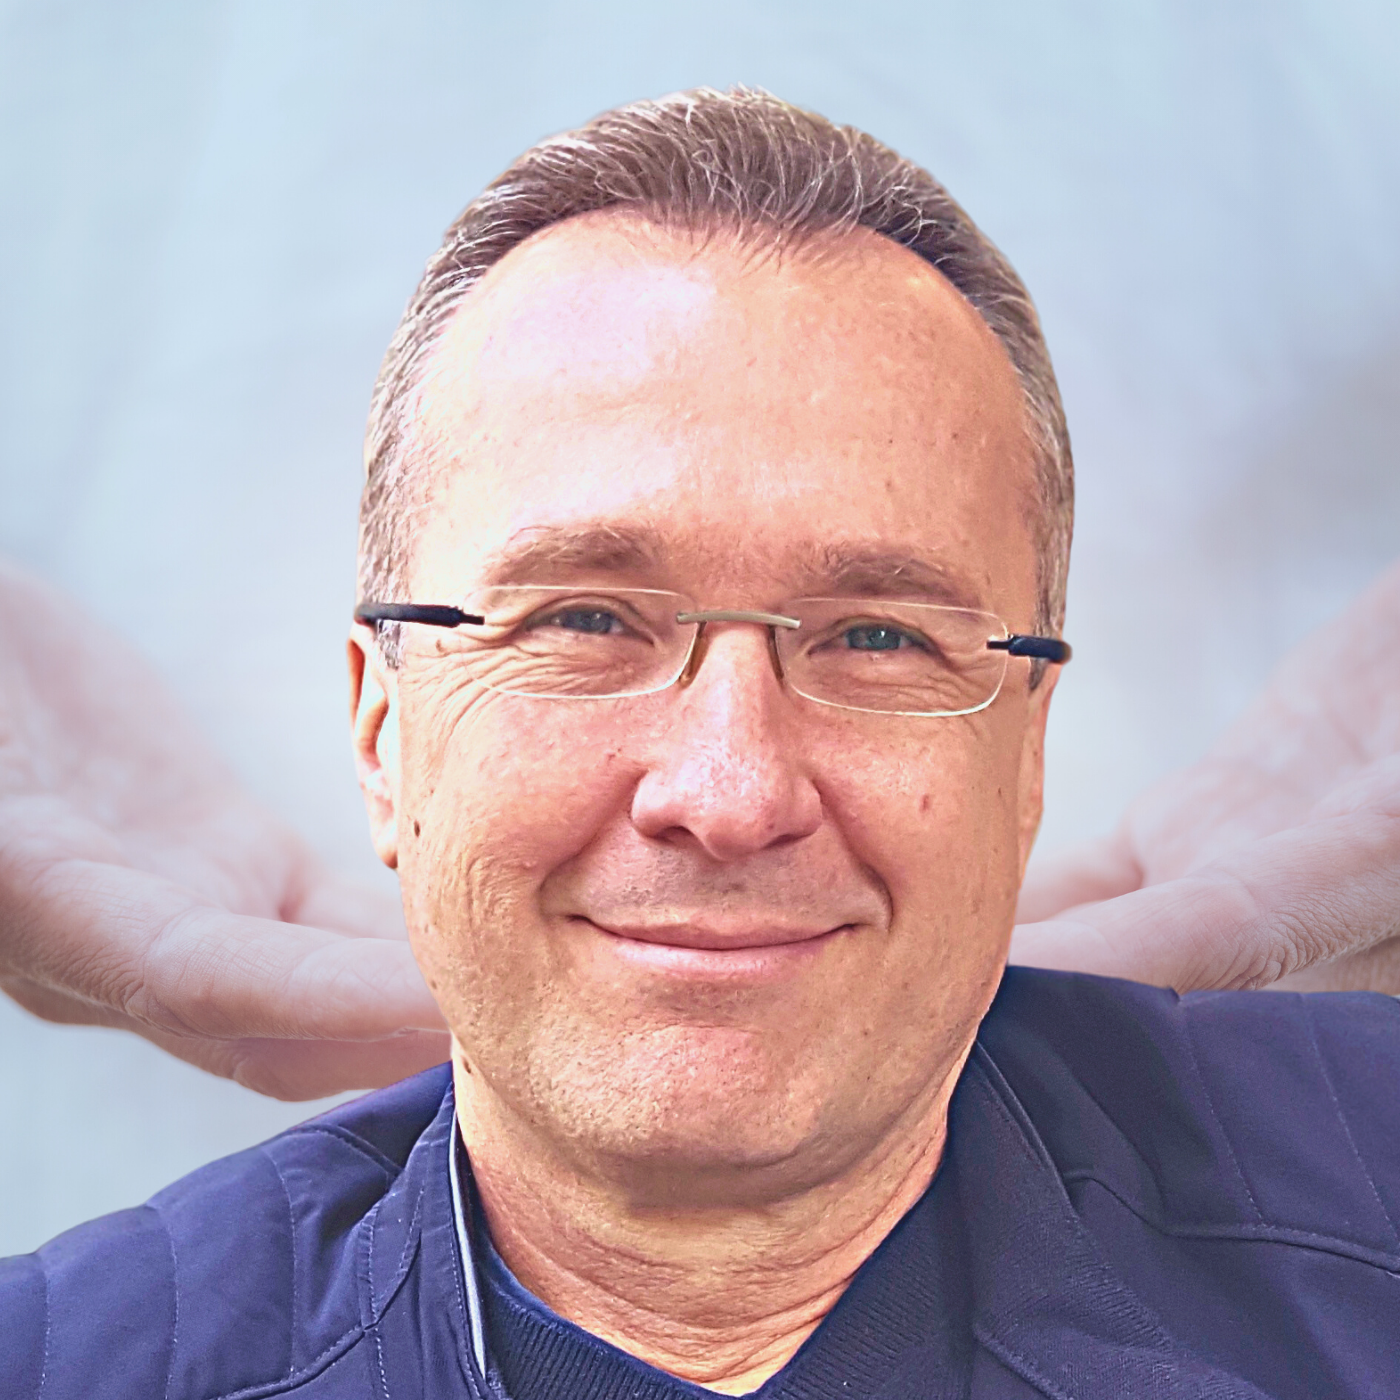 Pavel Vojtek